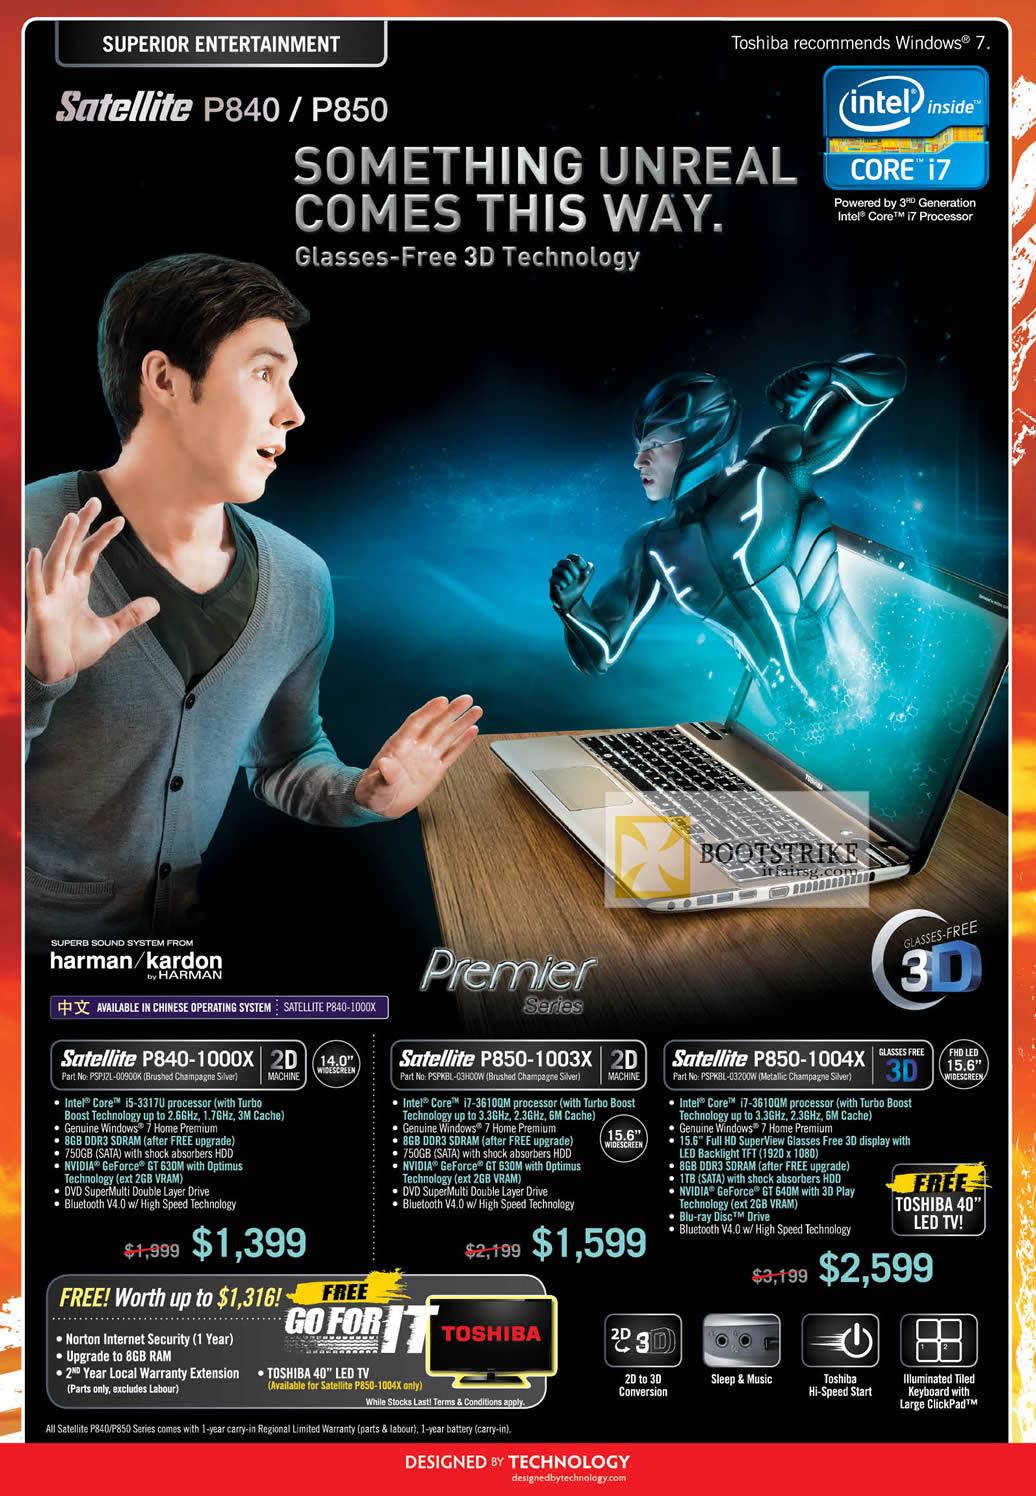 COMEX 2012 price list image brochure of Toshiba Notebooks Satellite P840-1000X, P850-1003X 1004X